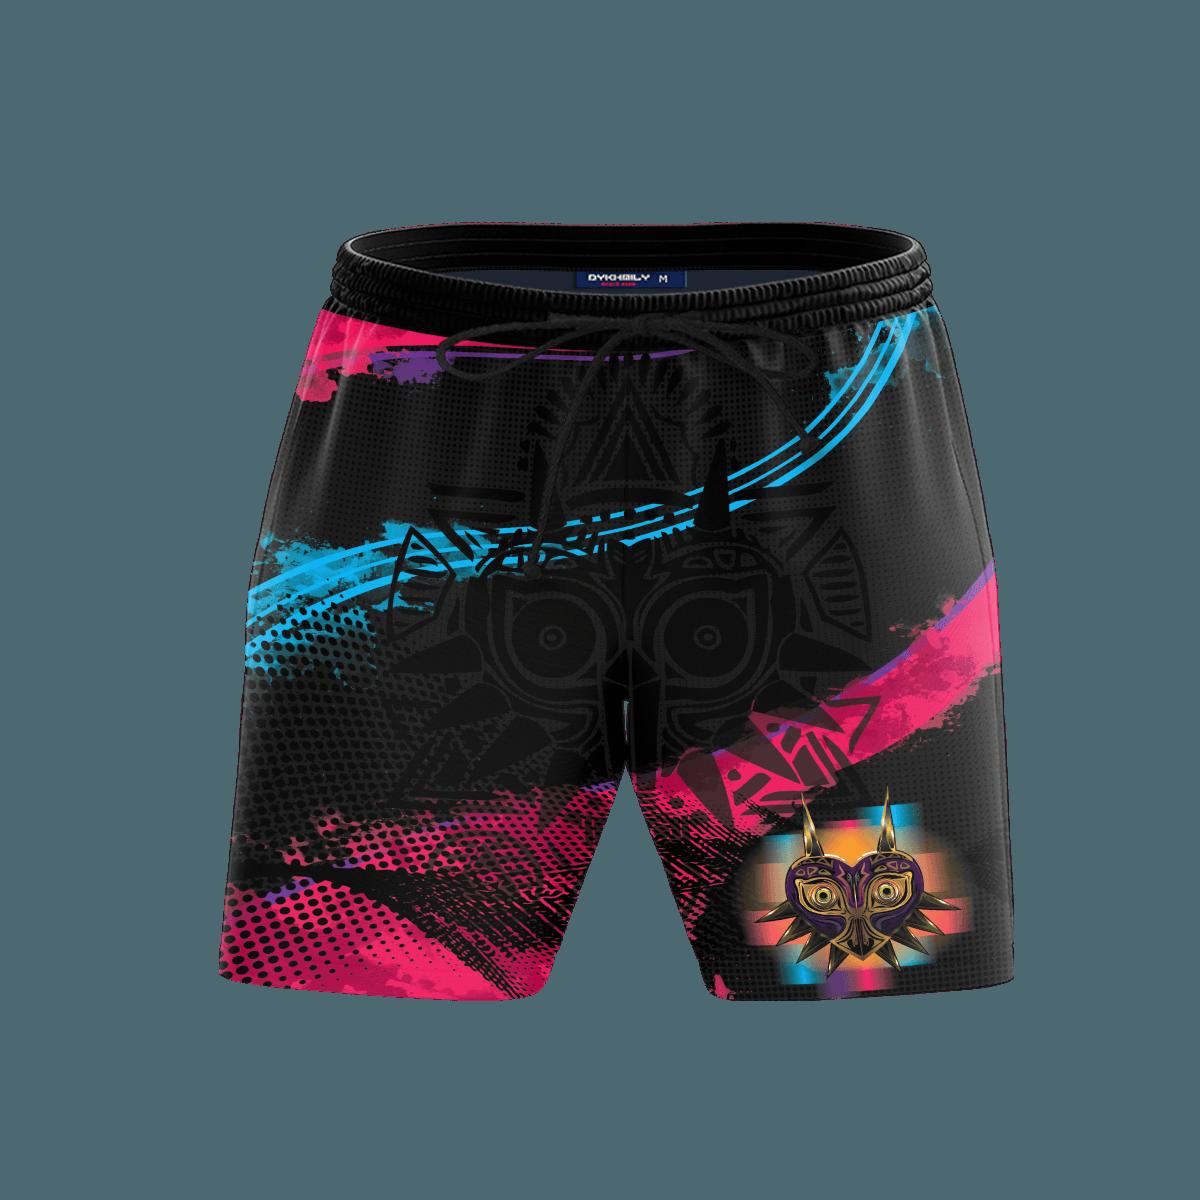 Zelda Majora Beach Shorts FDM3107 S Official Anime Swimsuit Merch